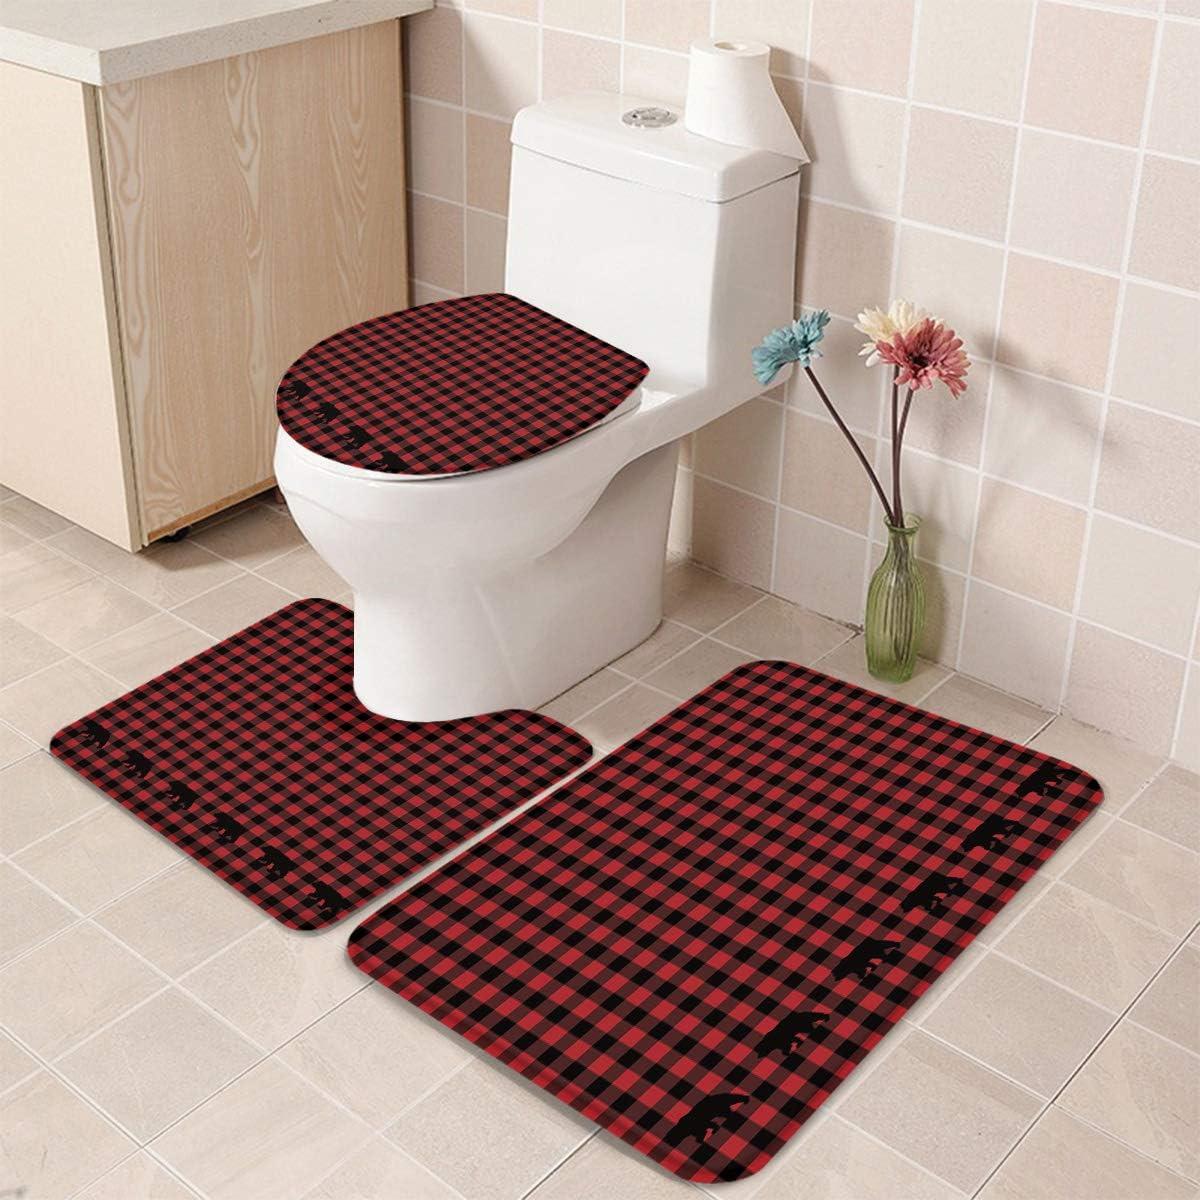 3 Pieces Bathroom Rug Set Non Buffalo Plaid Japan Maker Regular store New Decor Slip